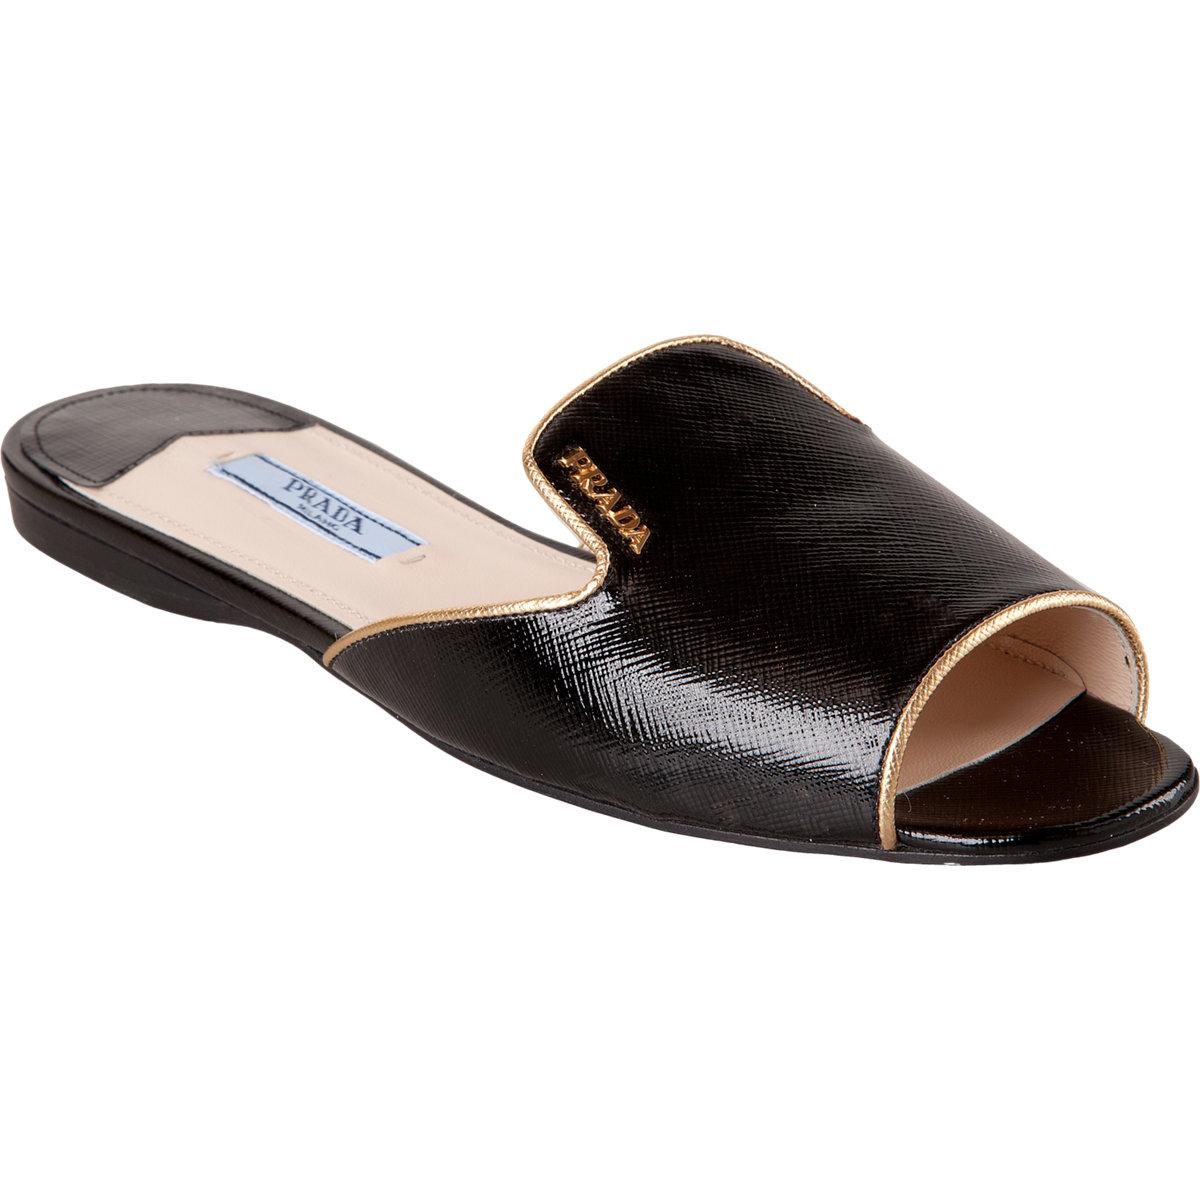 Sale Nicekicks Sale Newest Prada Open toe sandals Outlet Locations Sale Fashion Style kwCArTZ